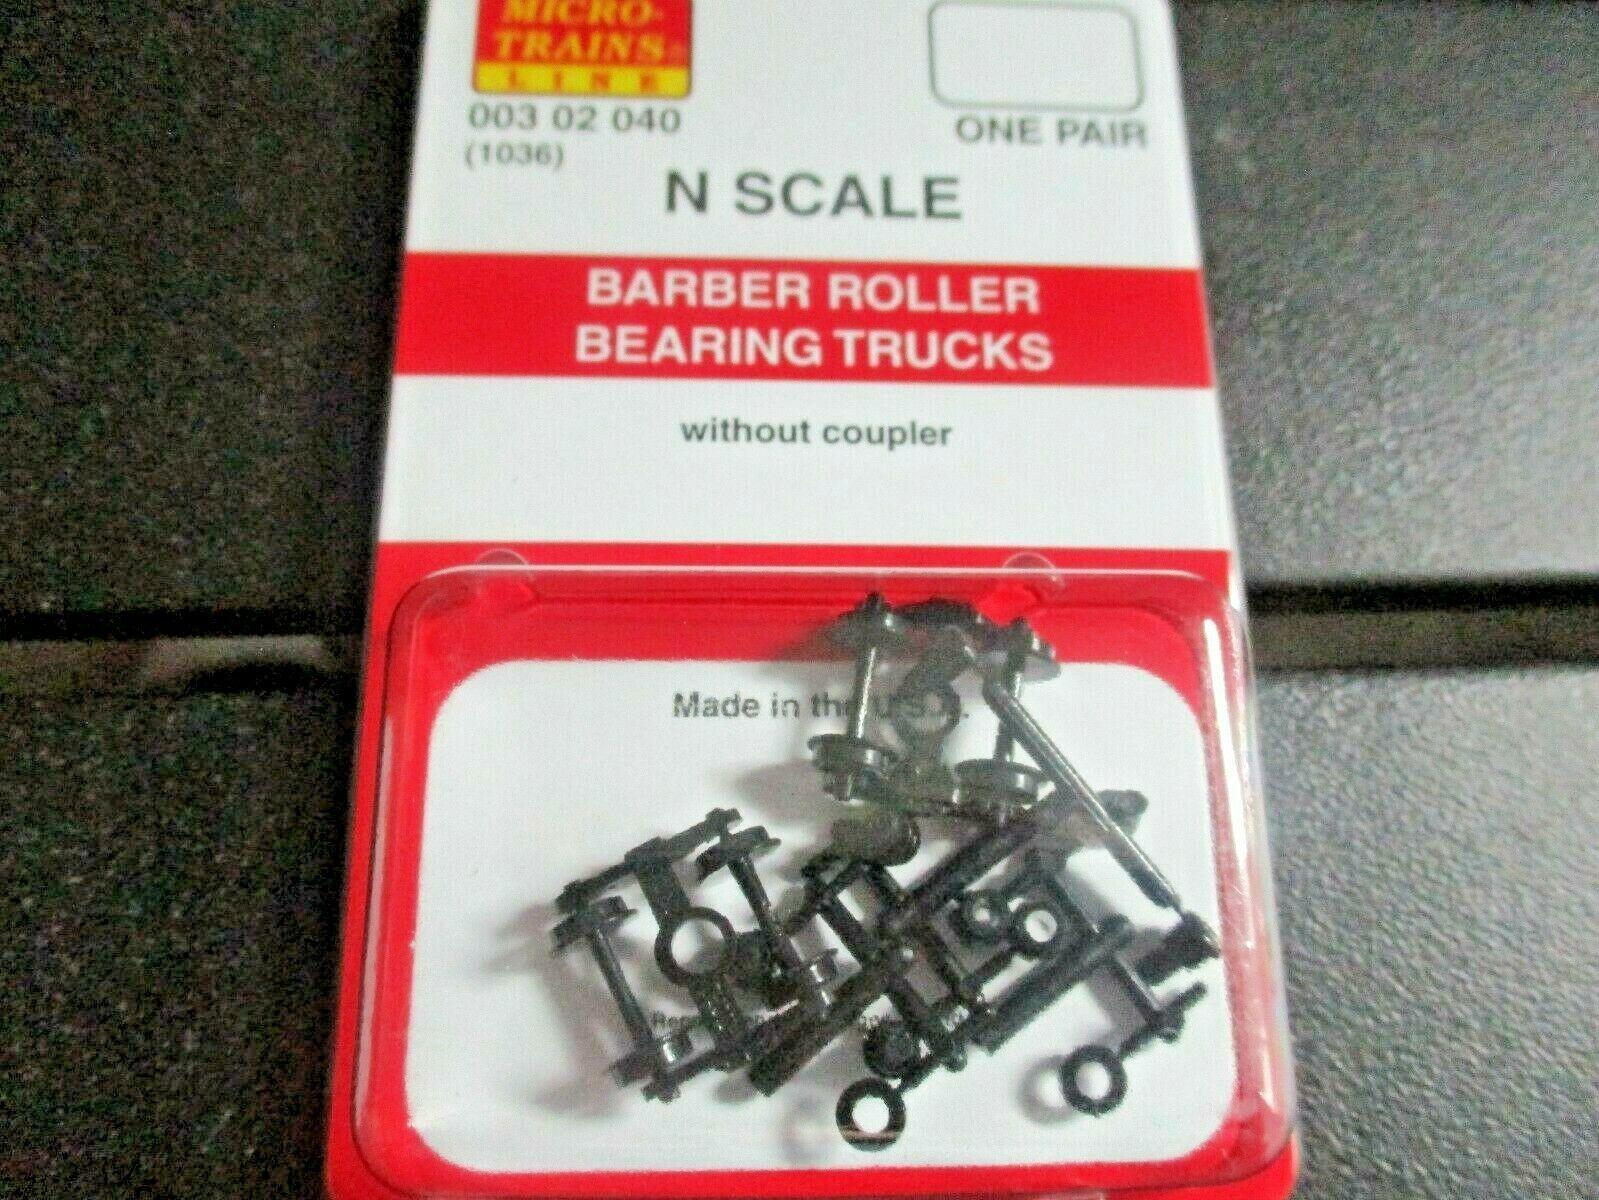 Micro-Trains Stock # 00302040 (1036) Barber Roller Bearing Trucks  No/Couplers N